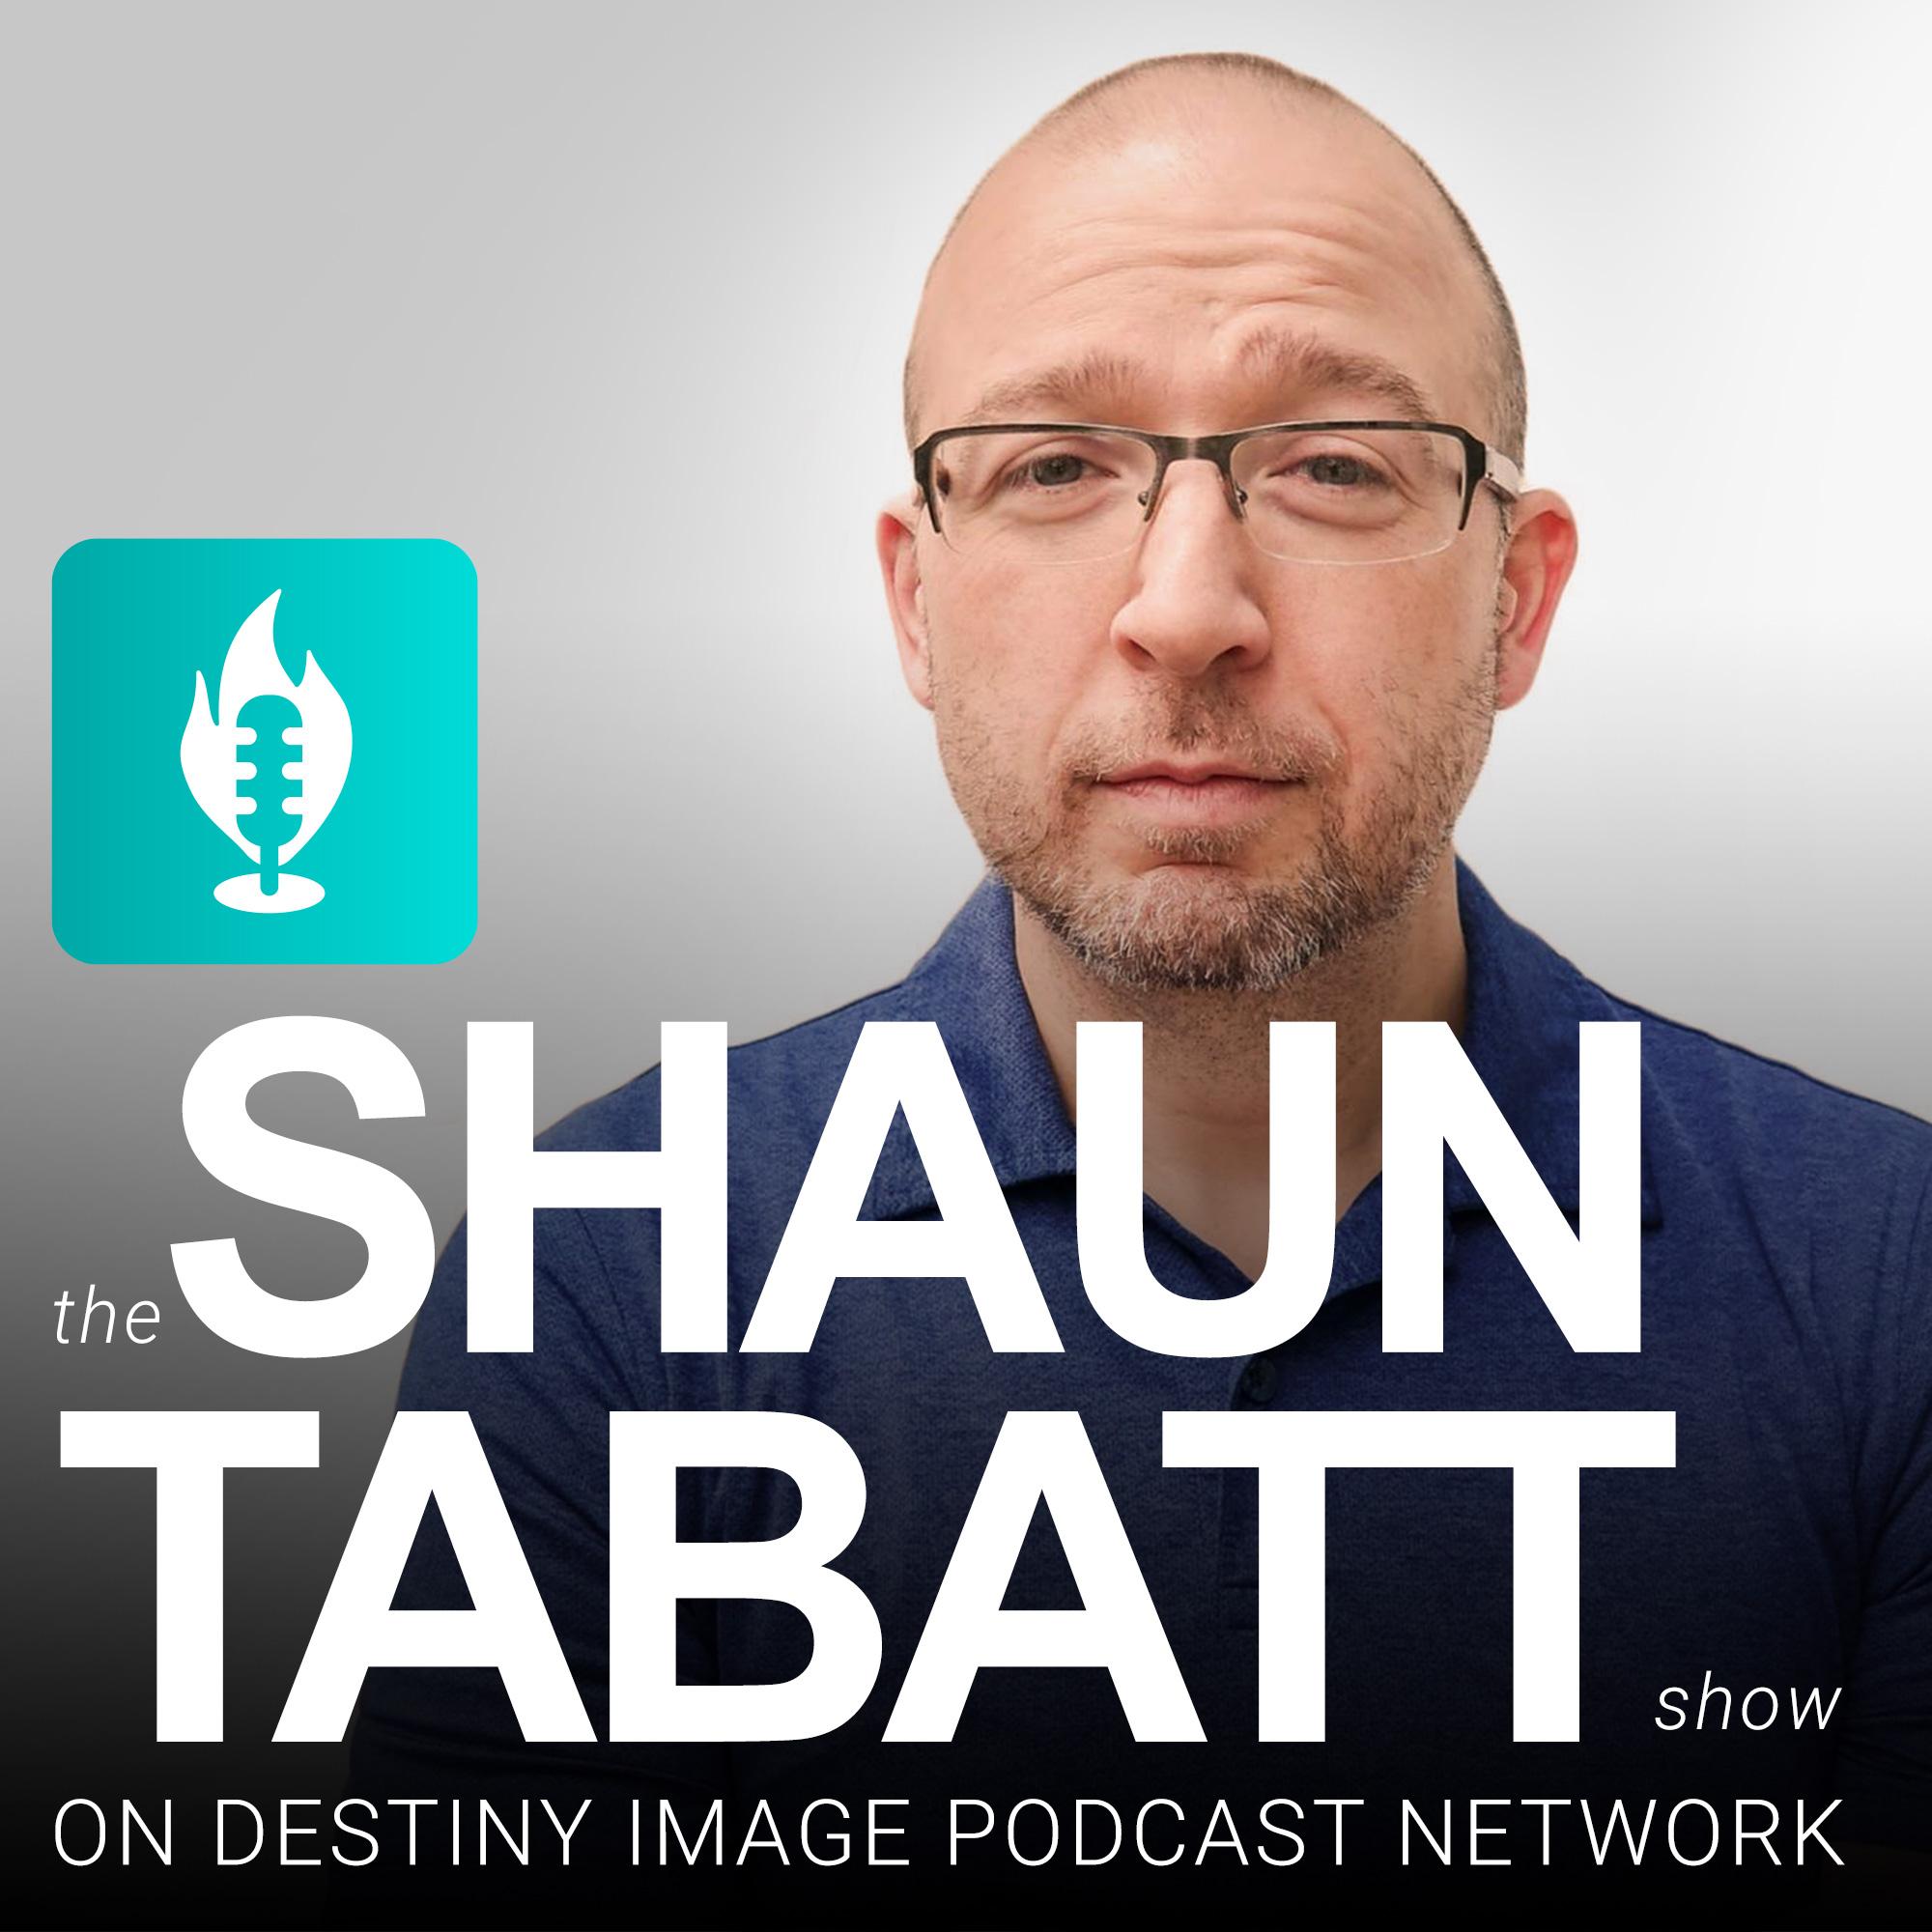 The Shaun Tabatt Show show art